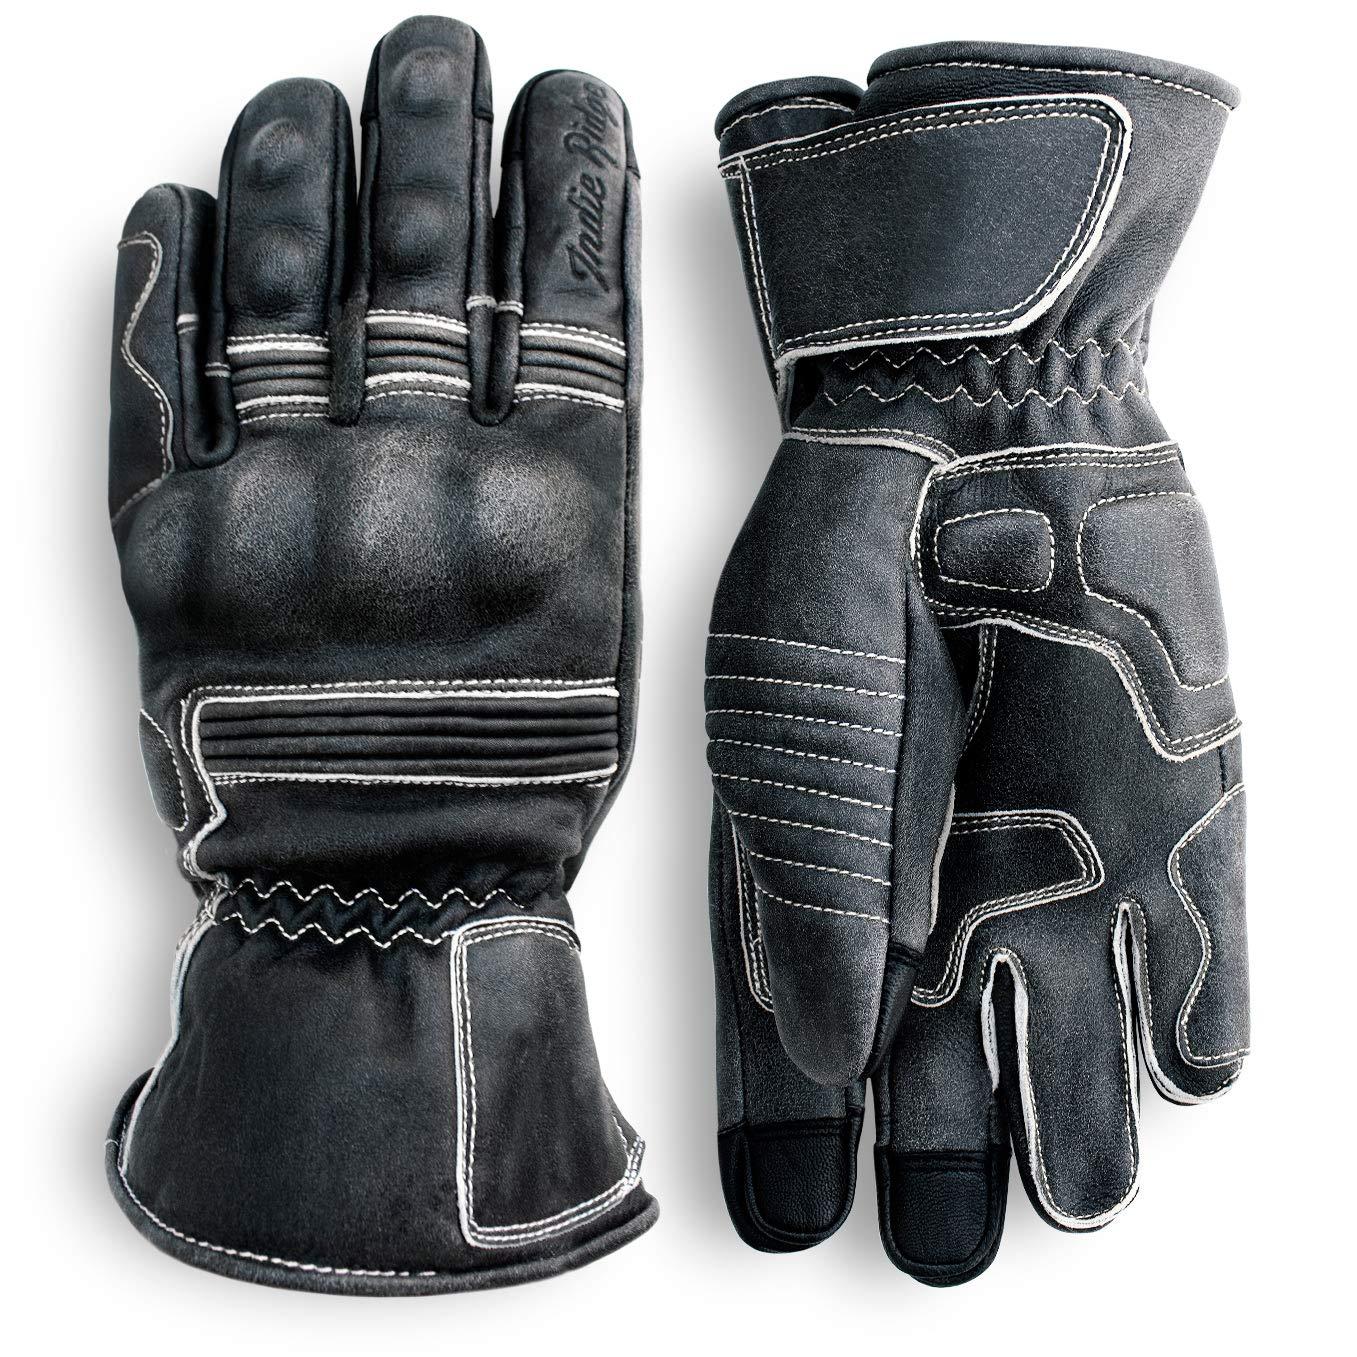 Pre-Weathered Premium Leather